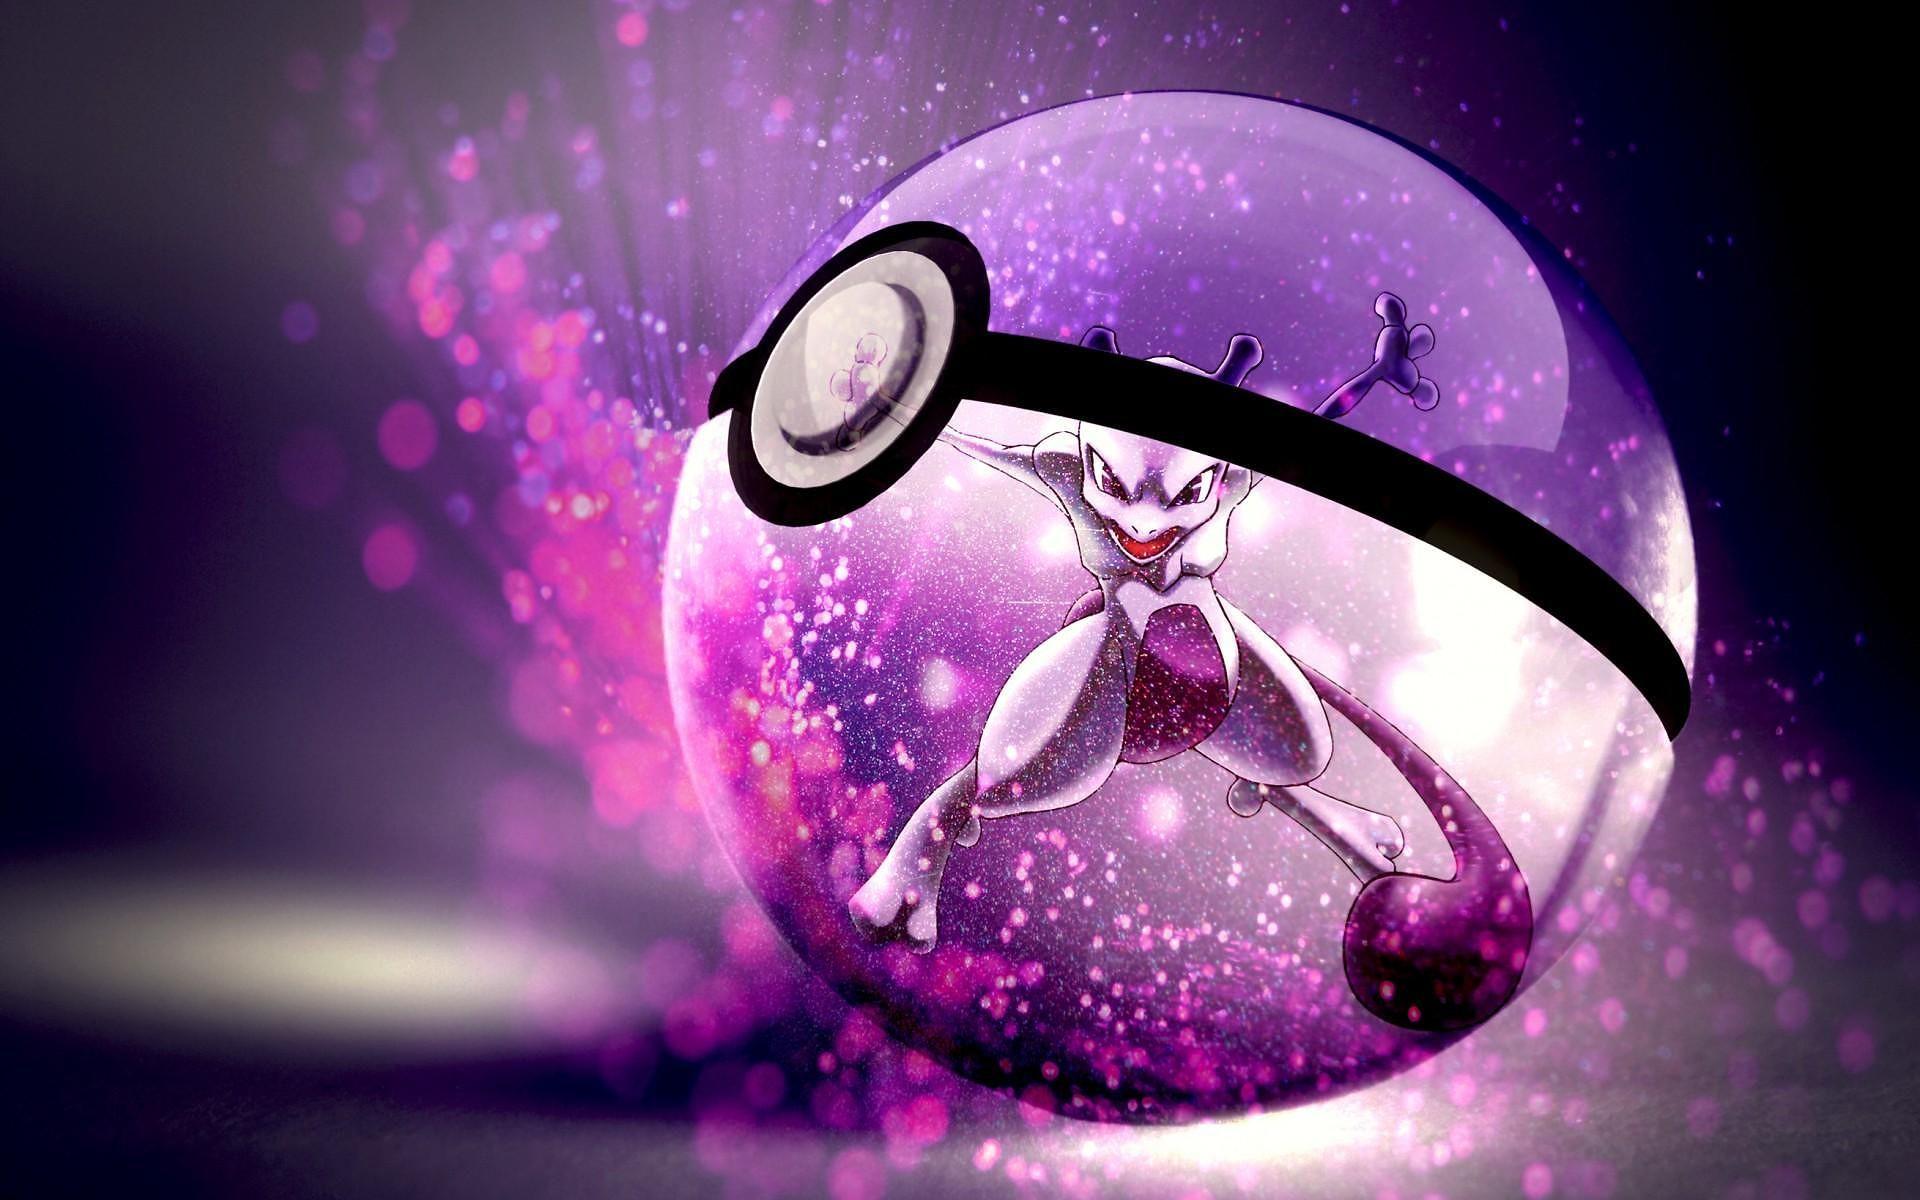 http://media.lpgenerator.ru/images/149172/pokemon-go-vs-pokemon-z-which-release-date-is-more-hyped-pok.jpg